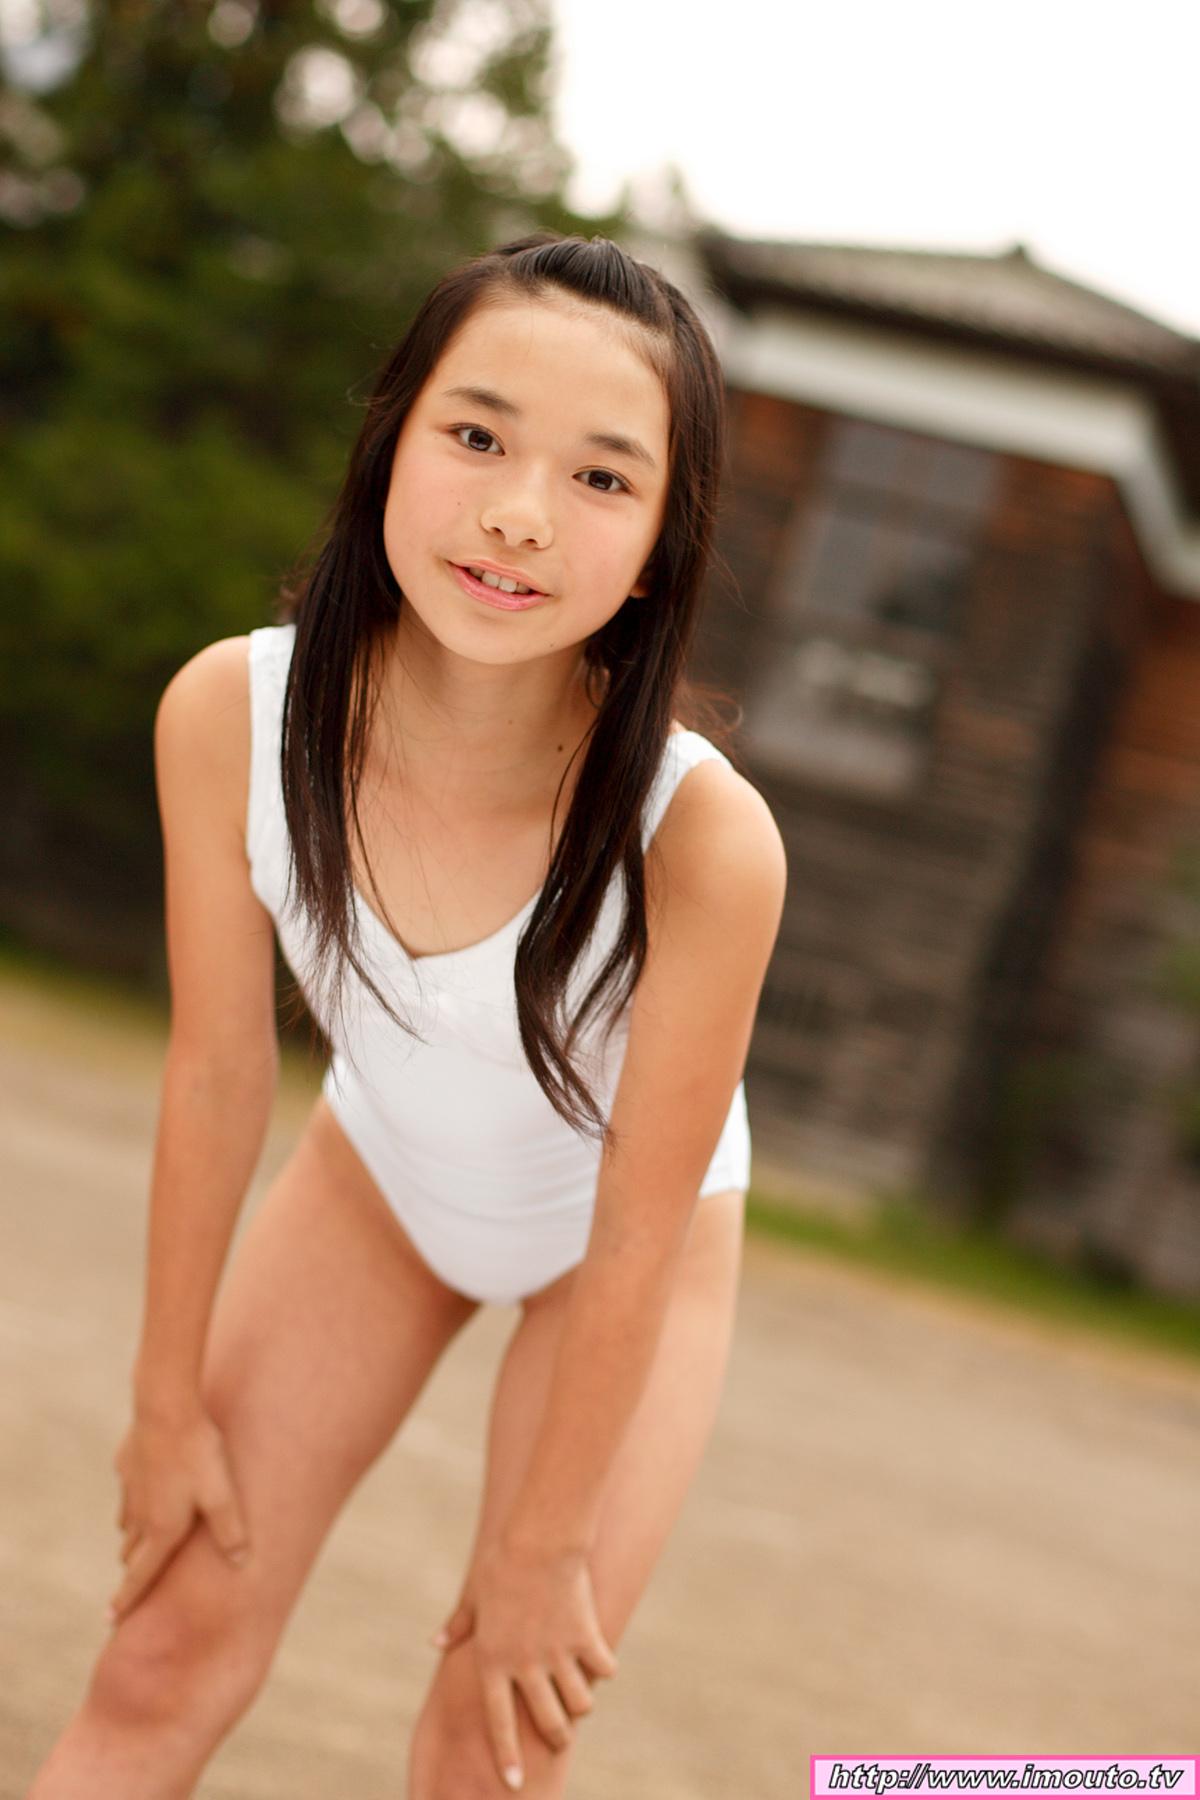 Tomoe Yamanaka(山中知惠) - Etude(11歲) B